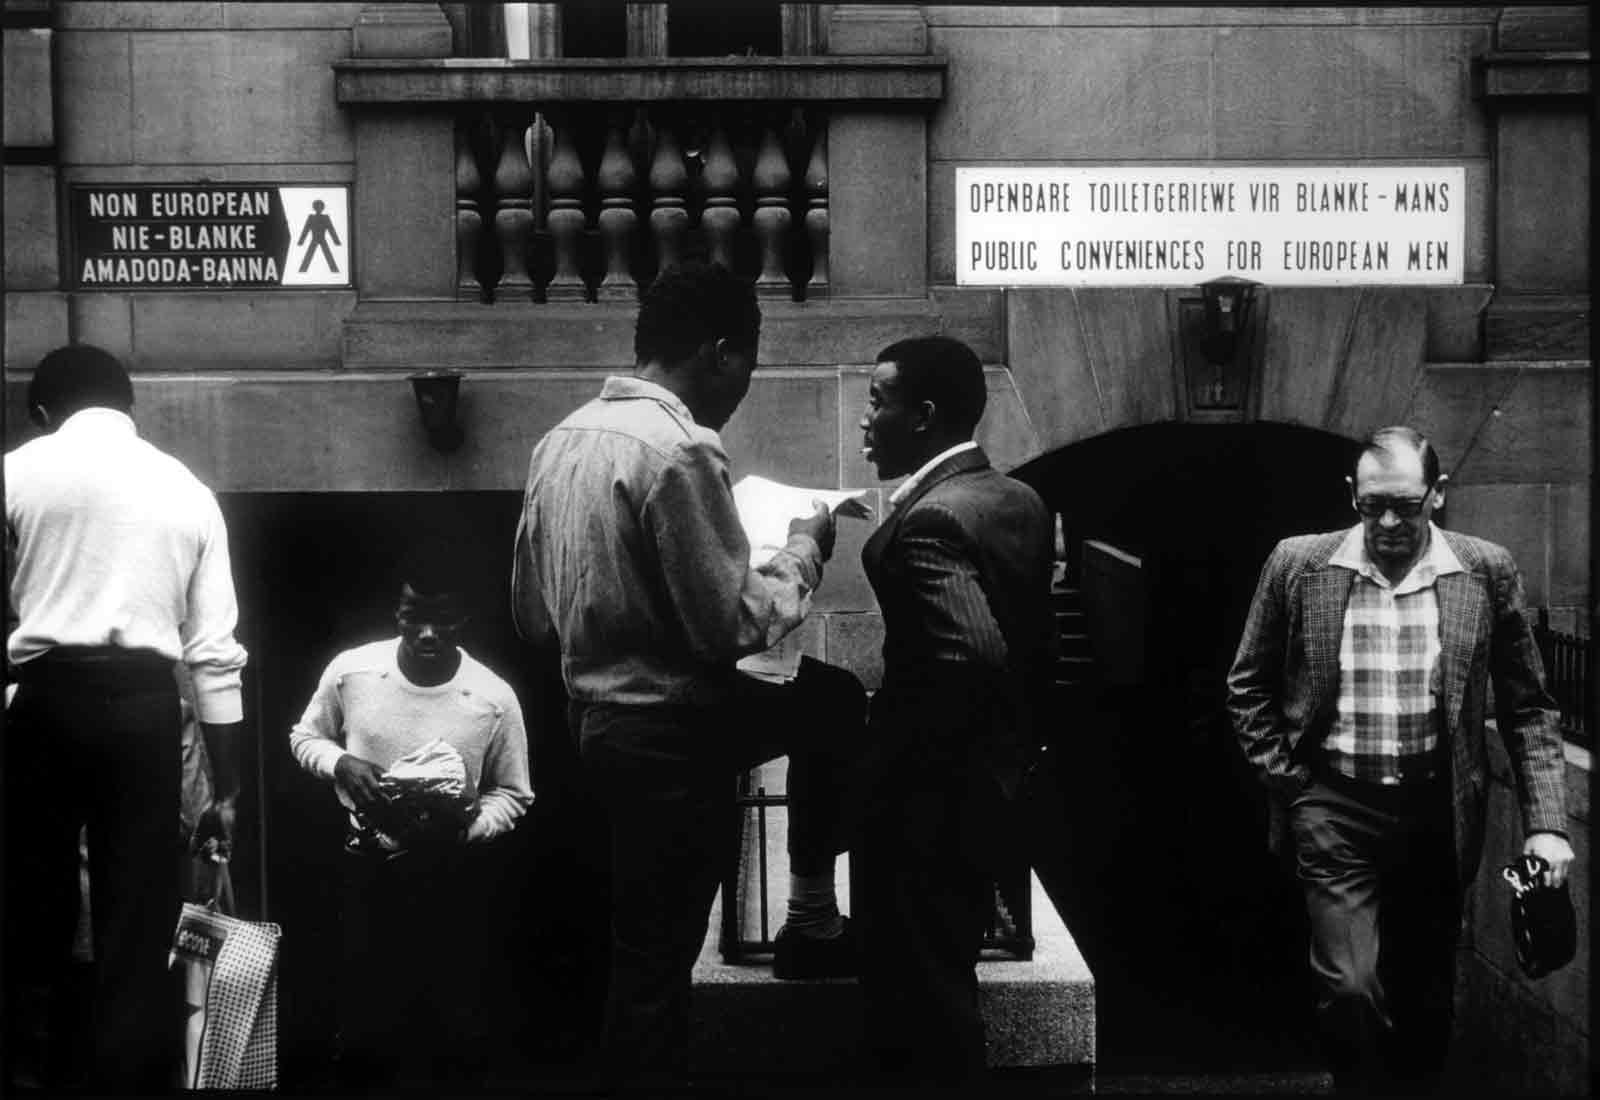 Segregated public lavatories at City Hall, Johannesburg, South Africa, 1984